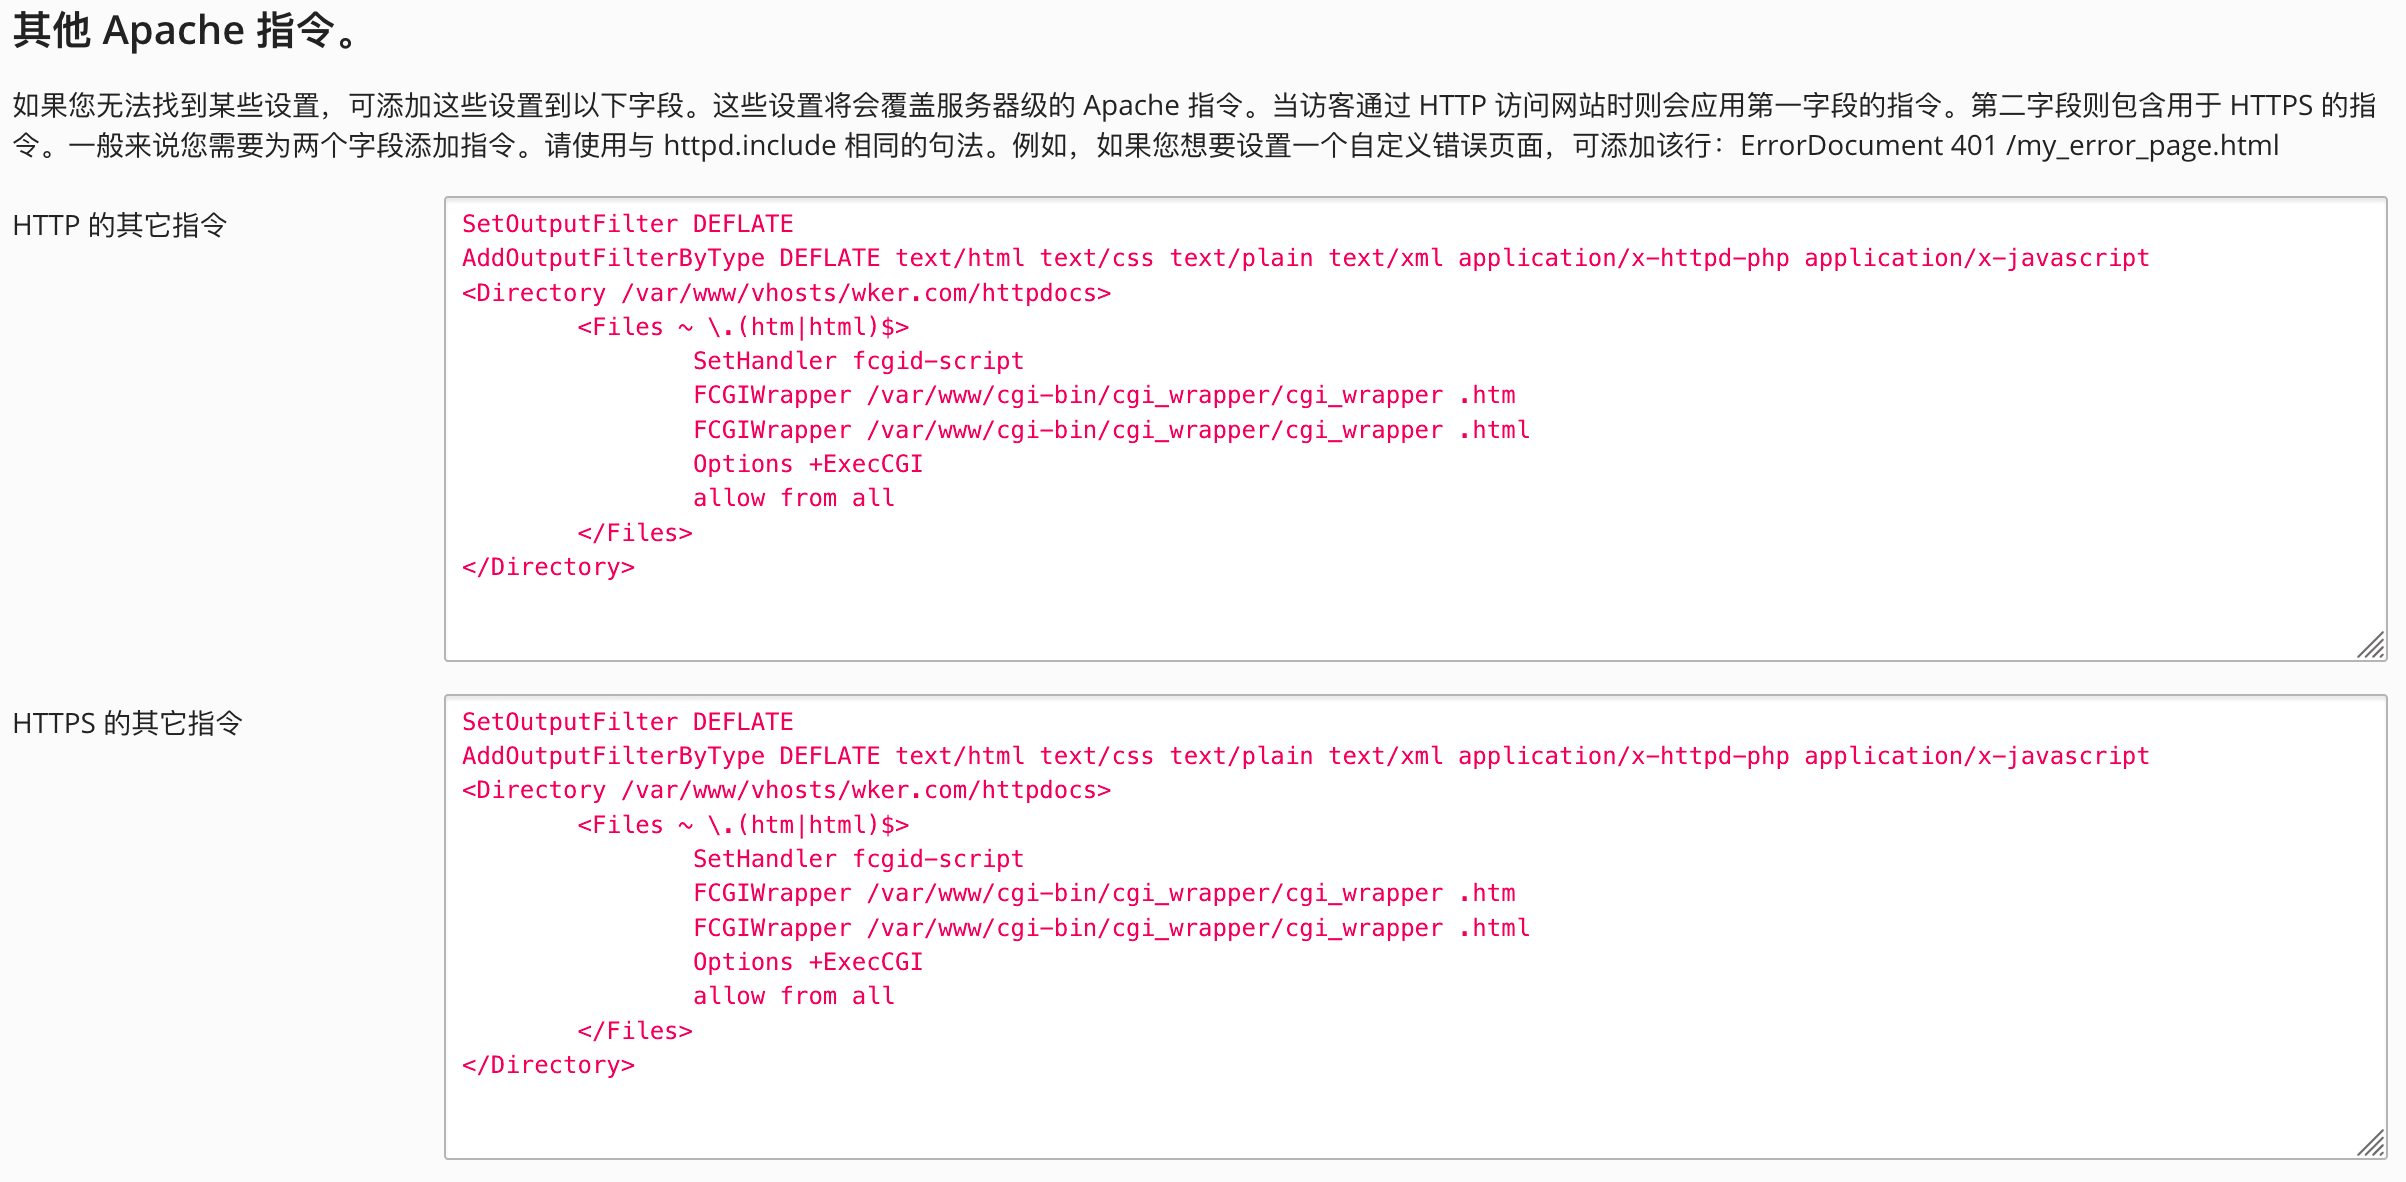 plesk 控制面板下使用 PHP 处理 html 文件